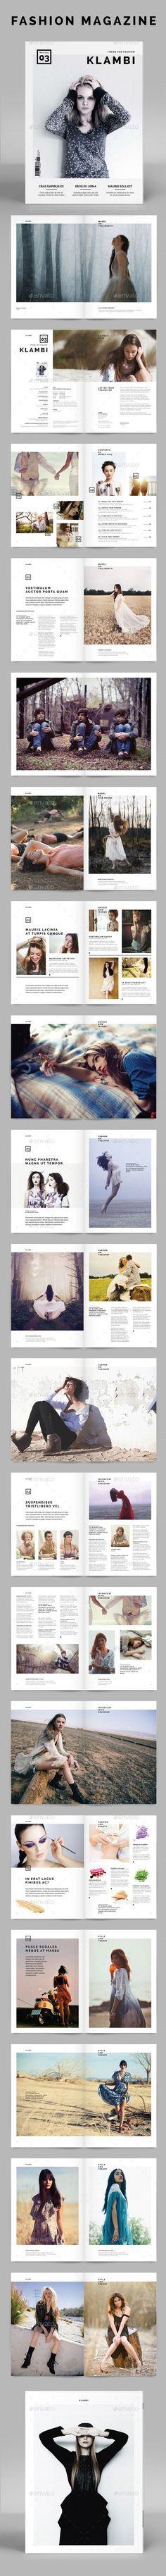 Fashion Magazine Klambi                                                                                                                                                     More